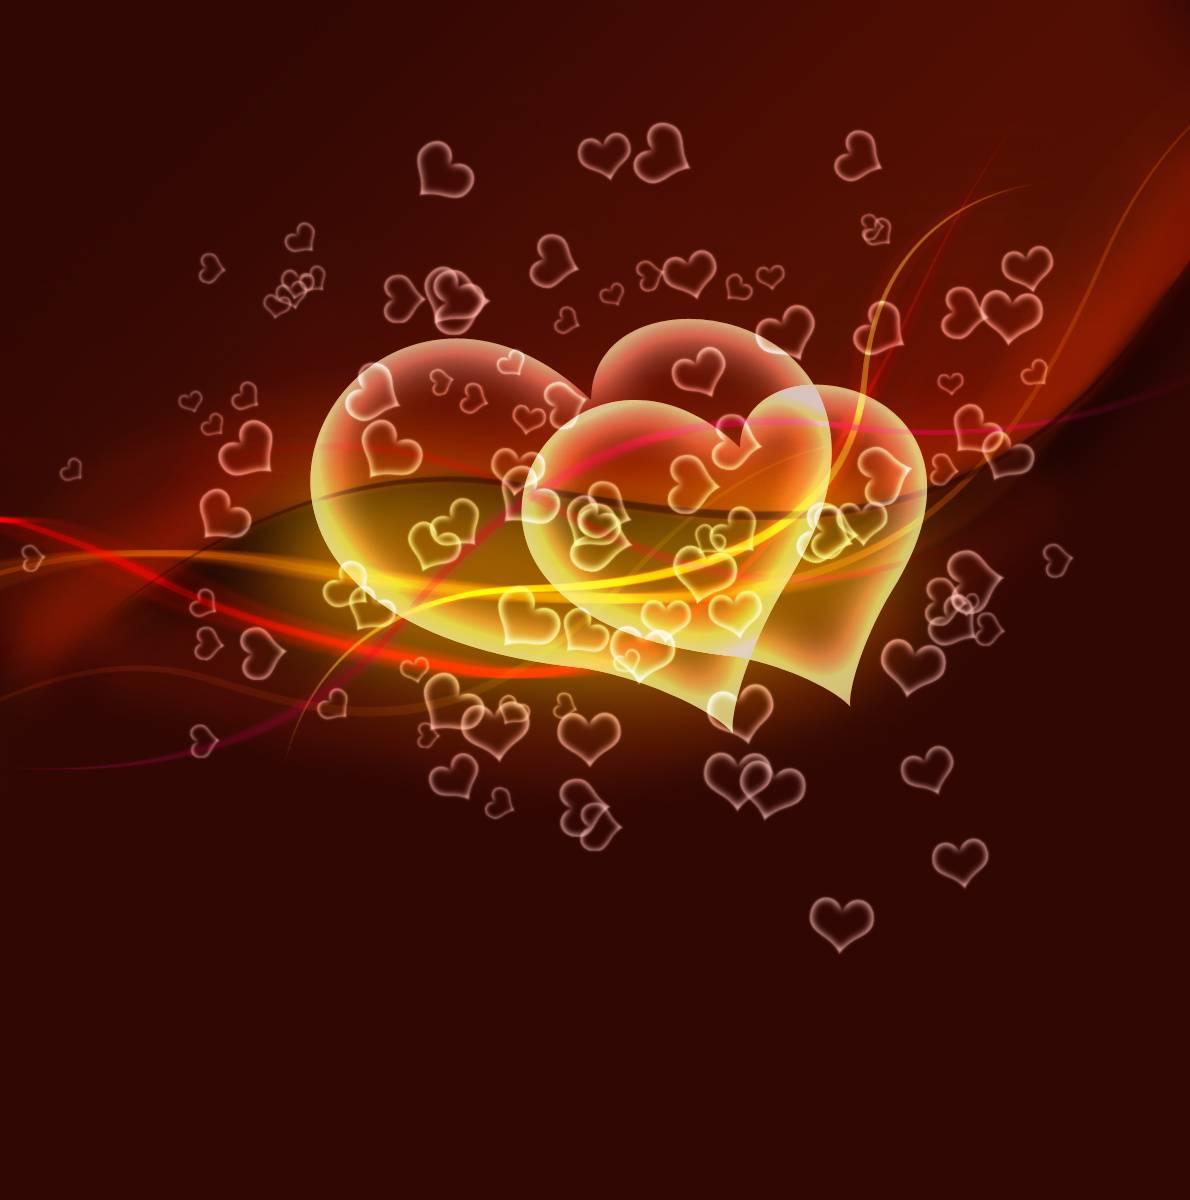 Love Hearts Wallpaper By Jagadeesh0v O ZEDGETM